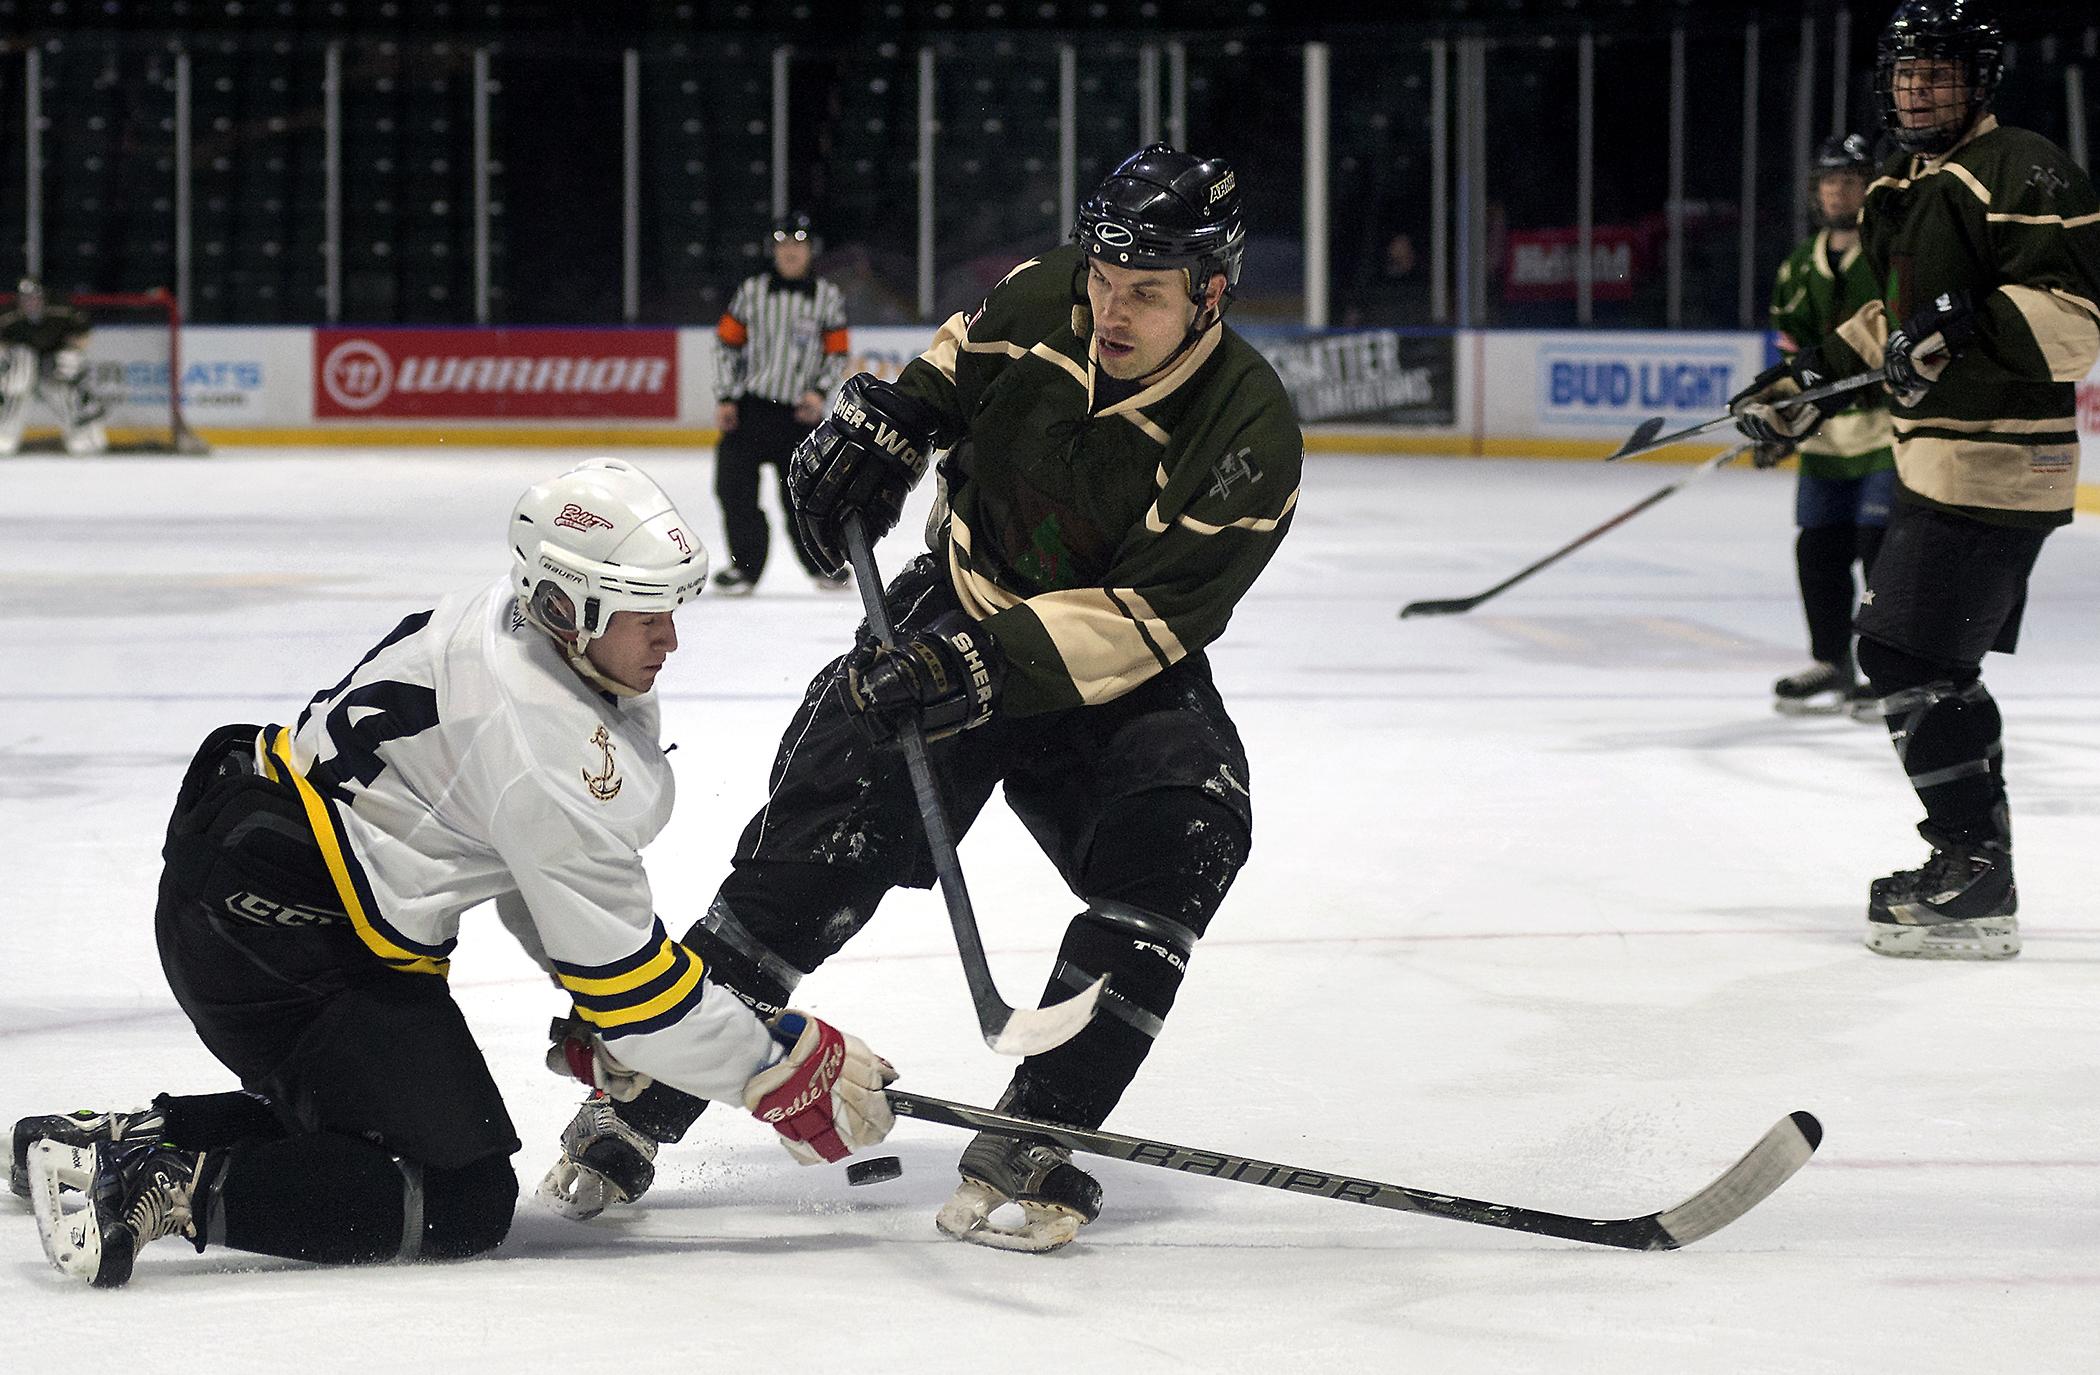 hockey13a_sh_170210